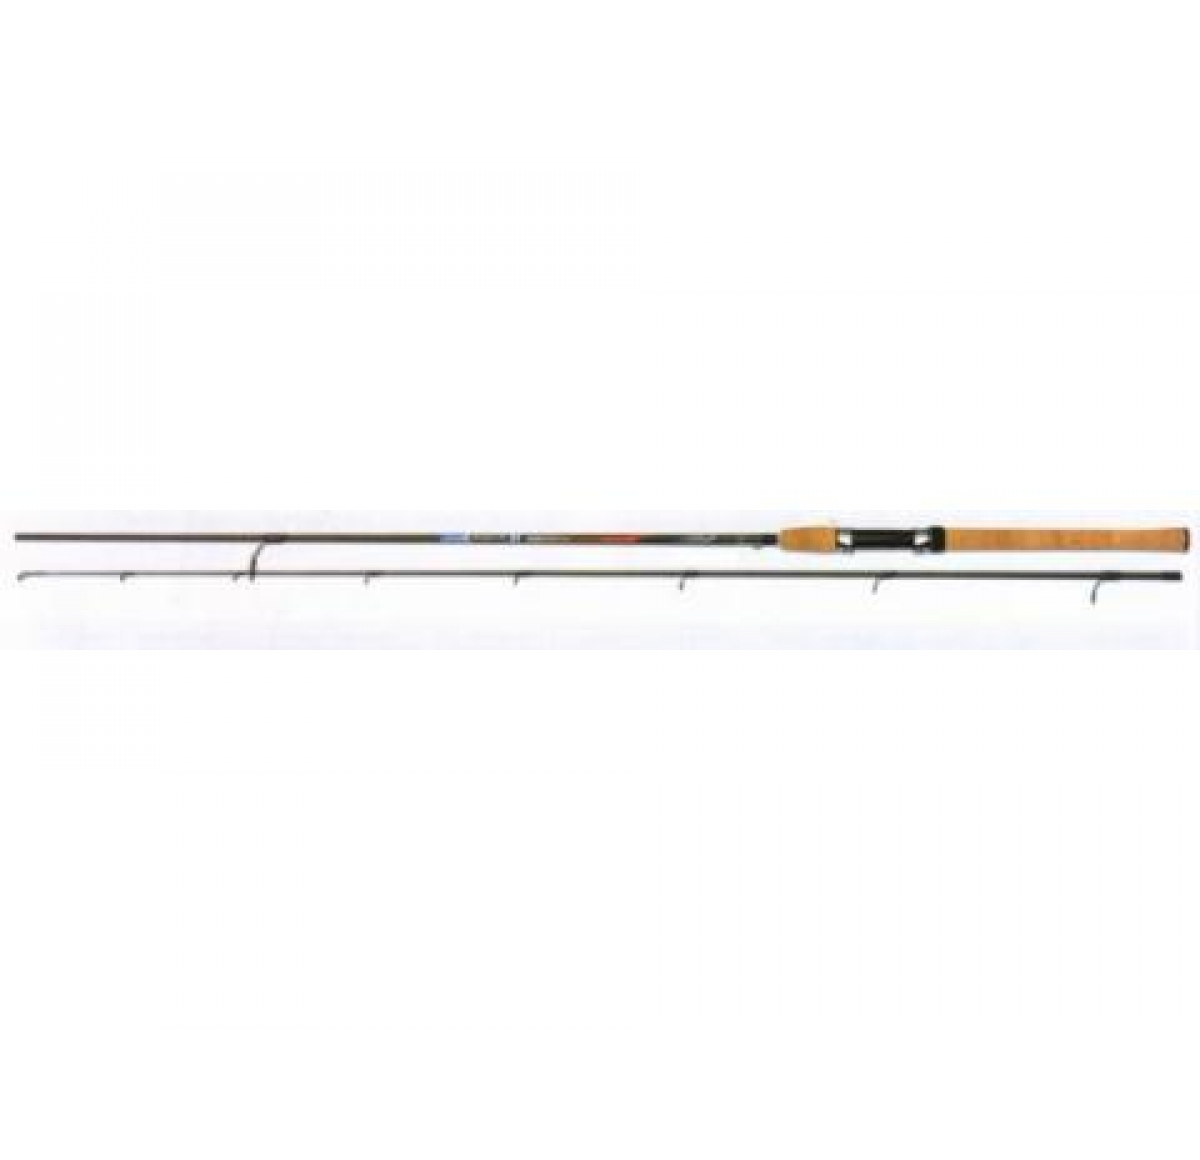 Mistrall Aqua Spin 270 cm 10-30 g